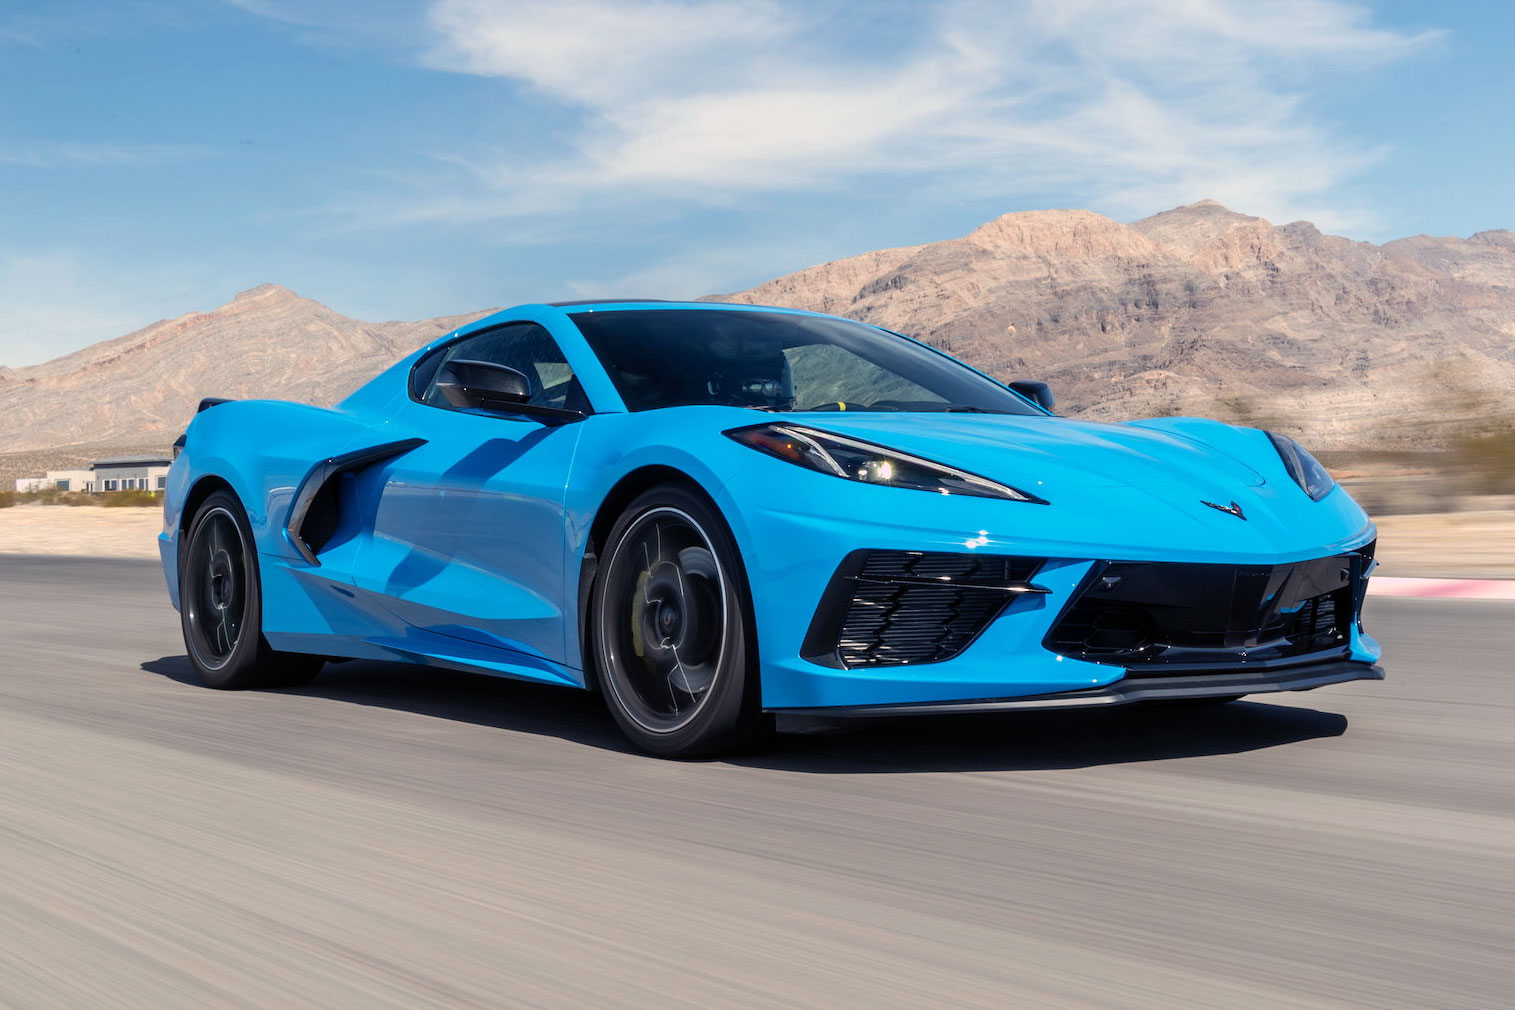 US car sales analysis 2020 - Sports cars - carsalesbase.com